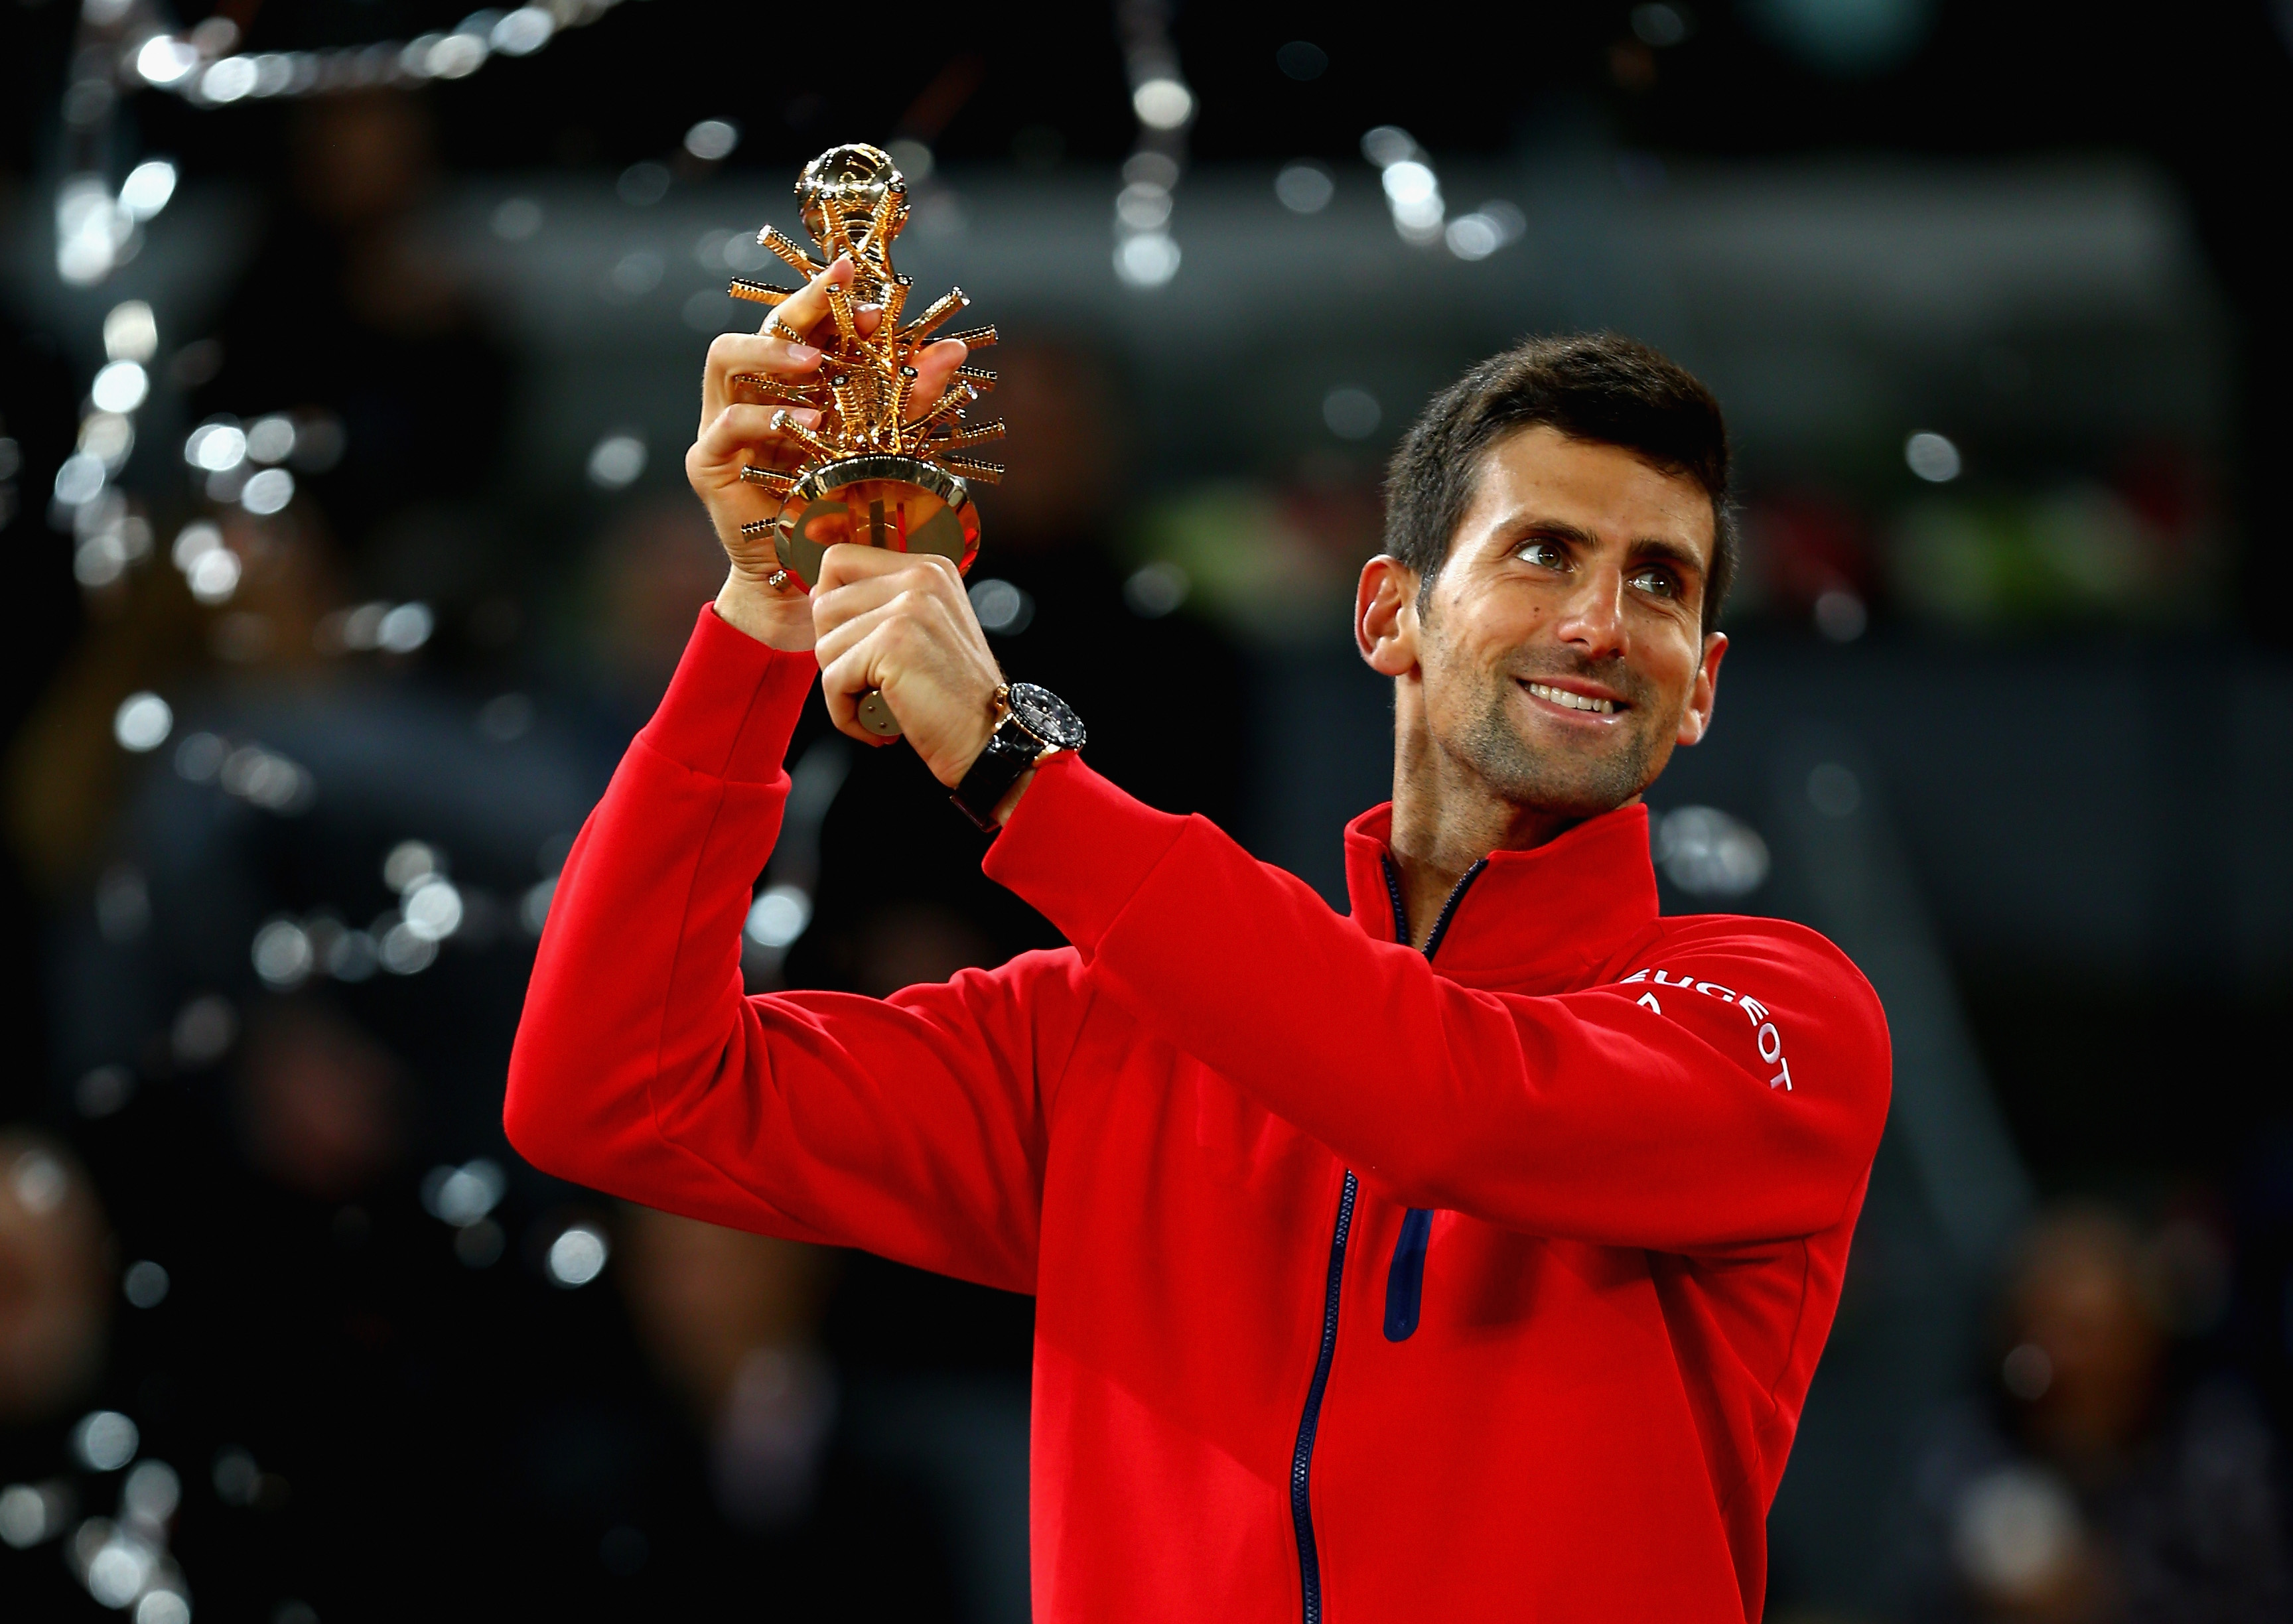 Tennis Djokovic vince torneo di Madrid, in arrivo a Roma